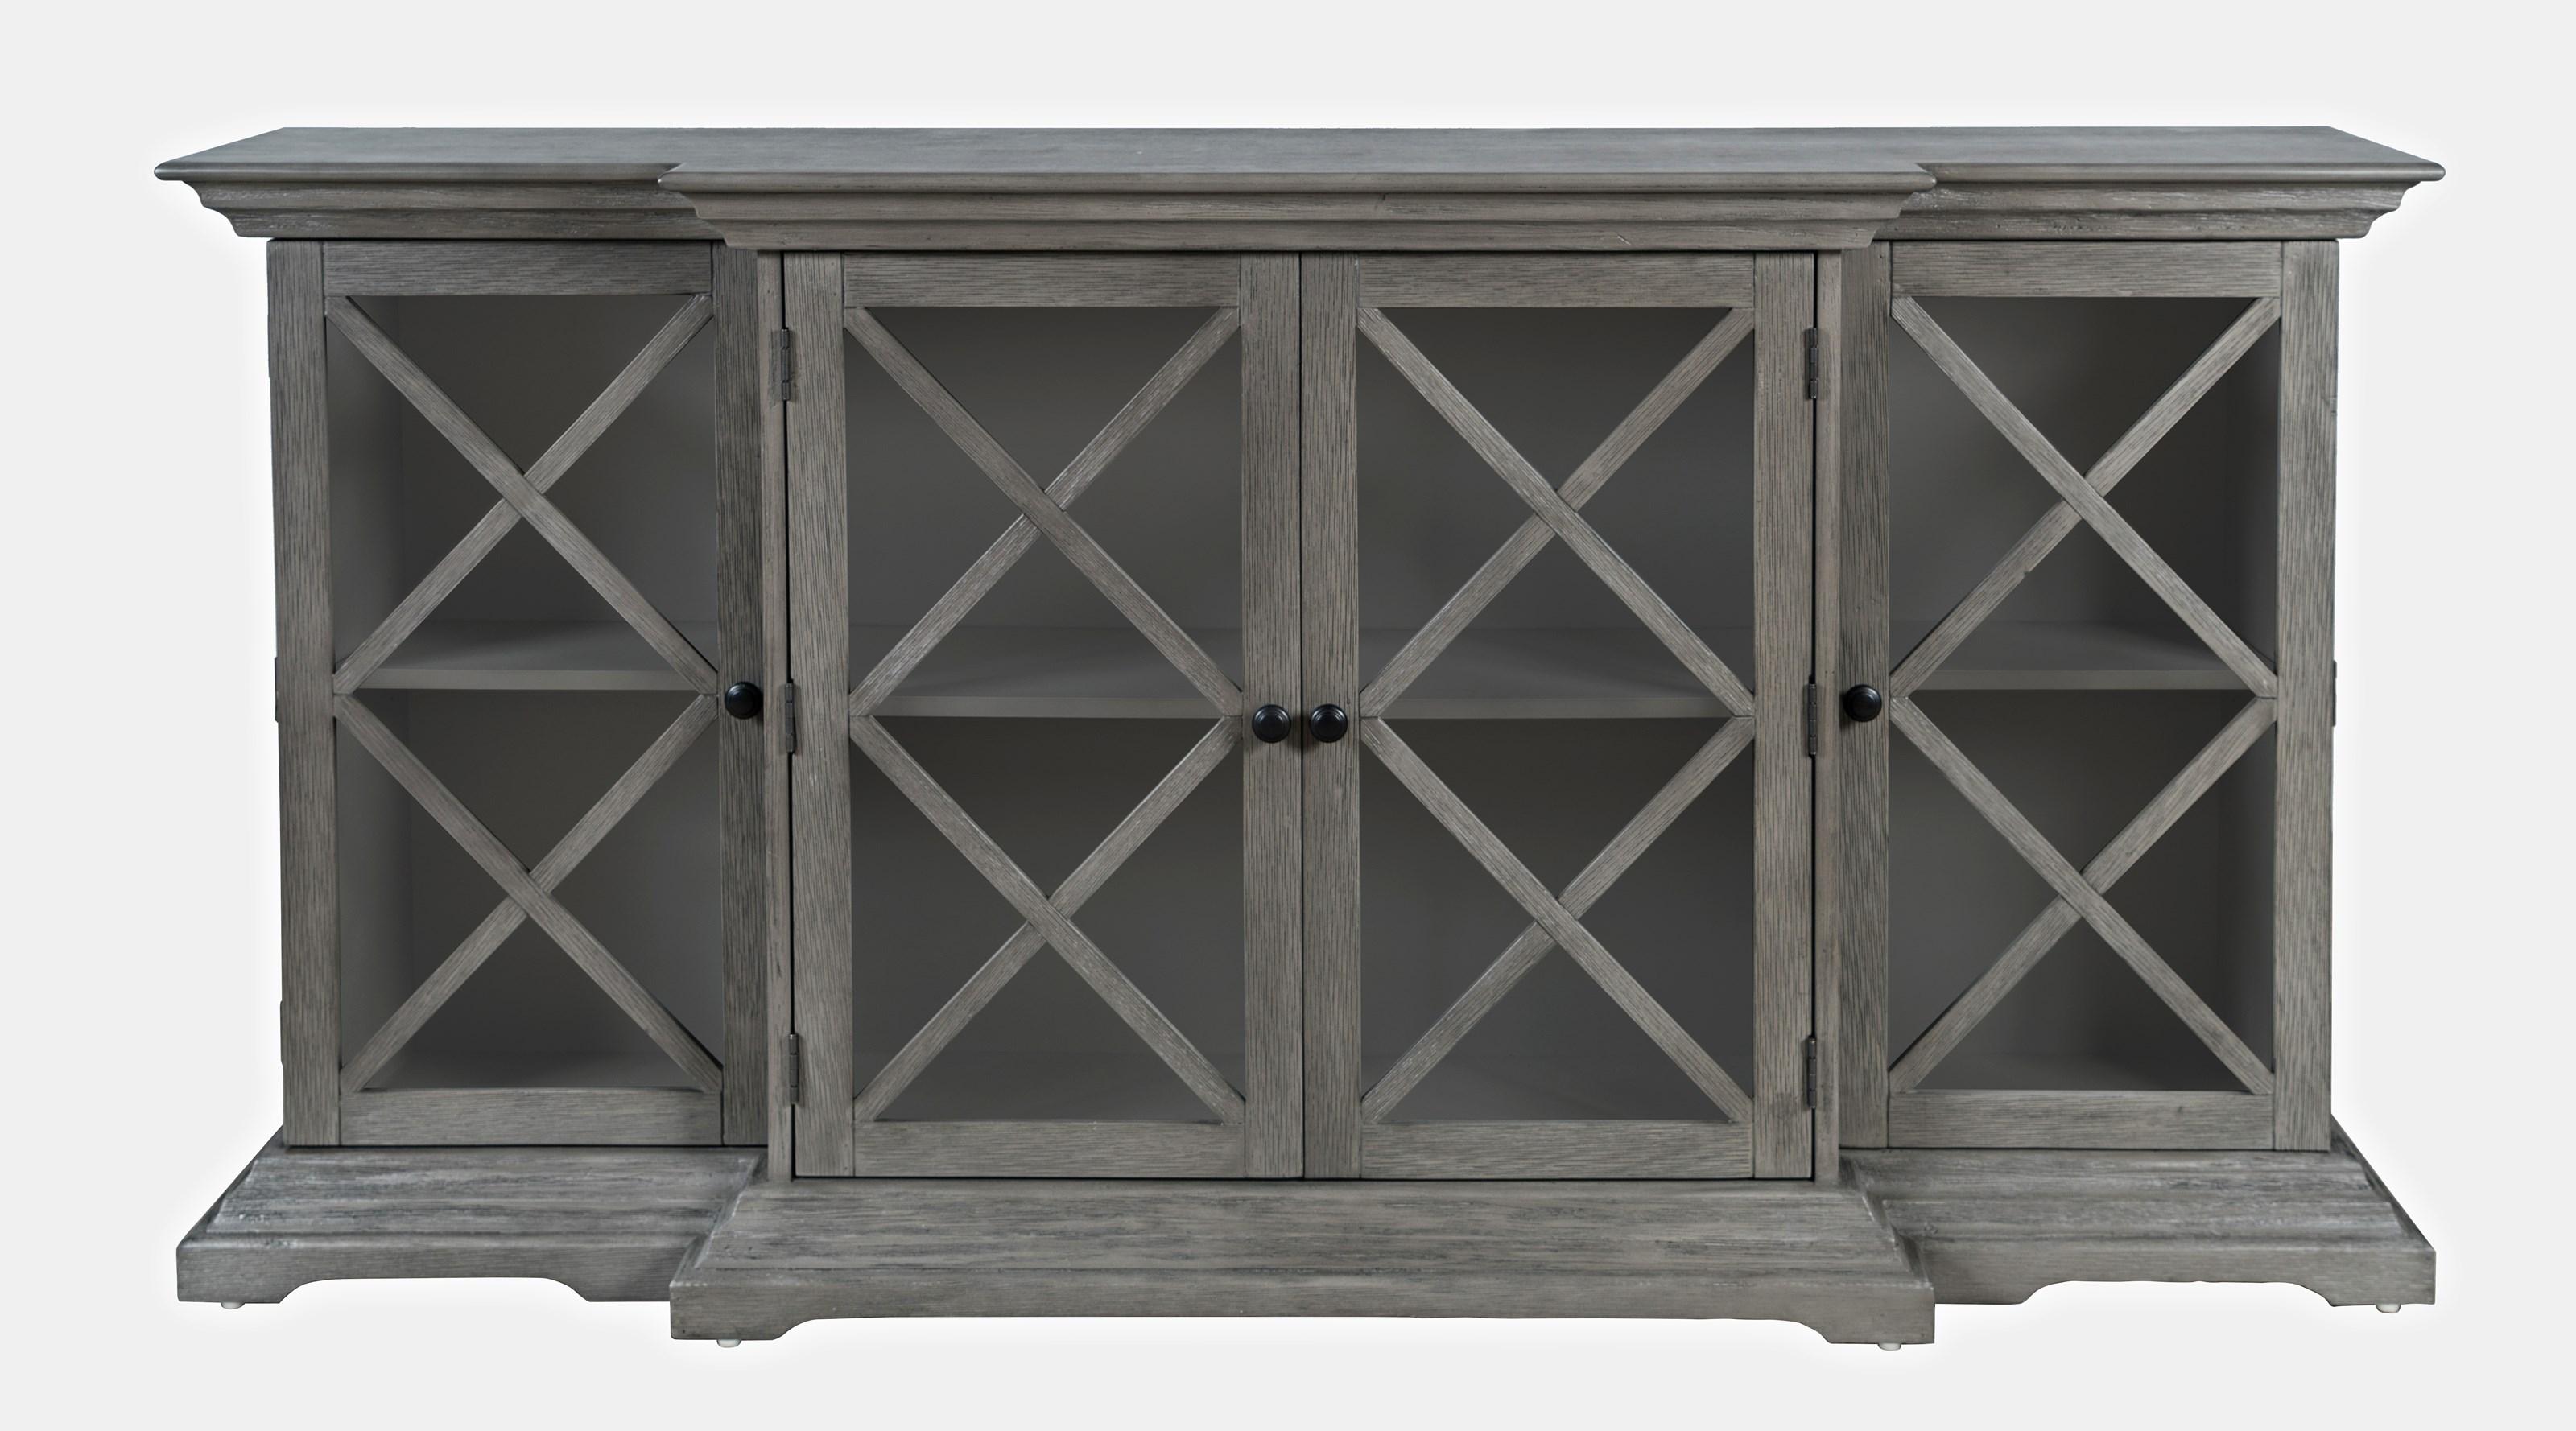 Carrington Large Breakfront Cabinet by Jofran at Jofran